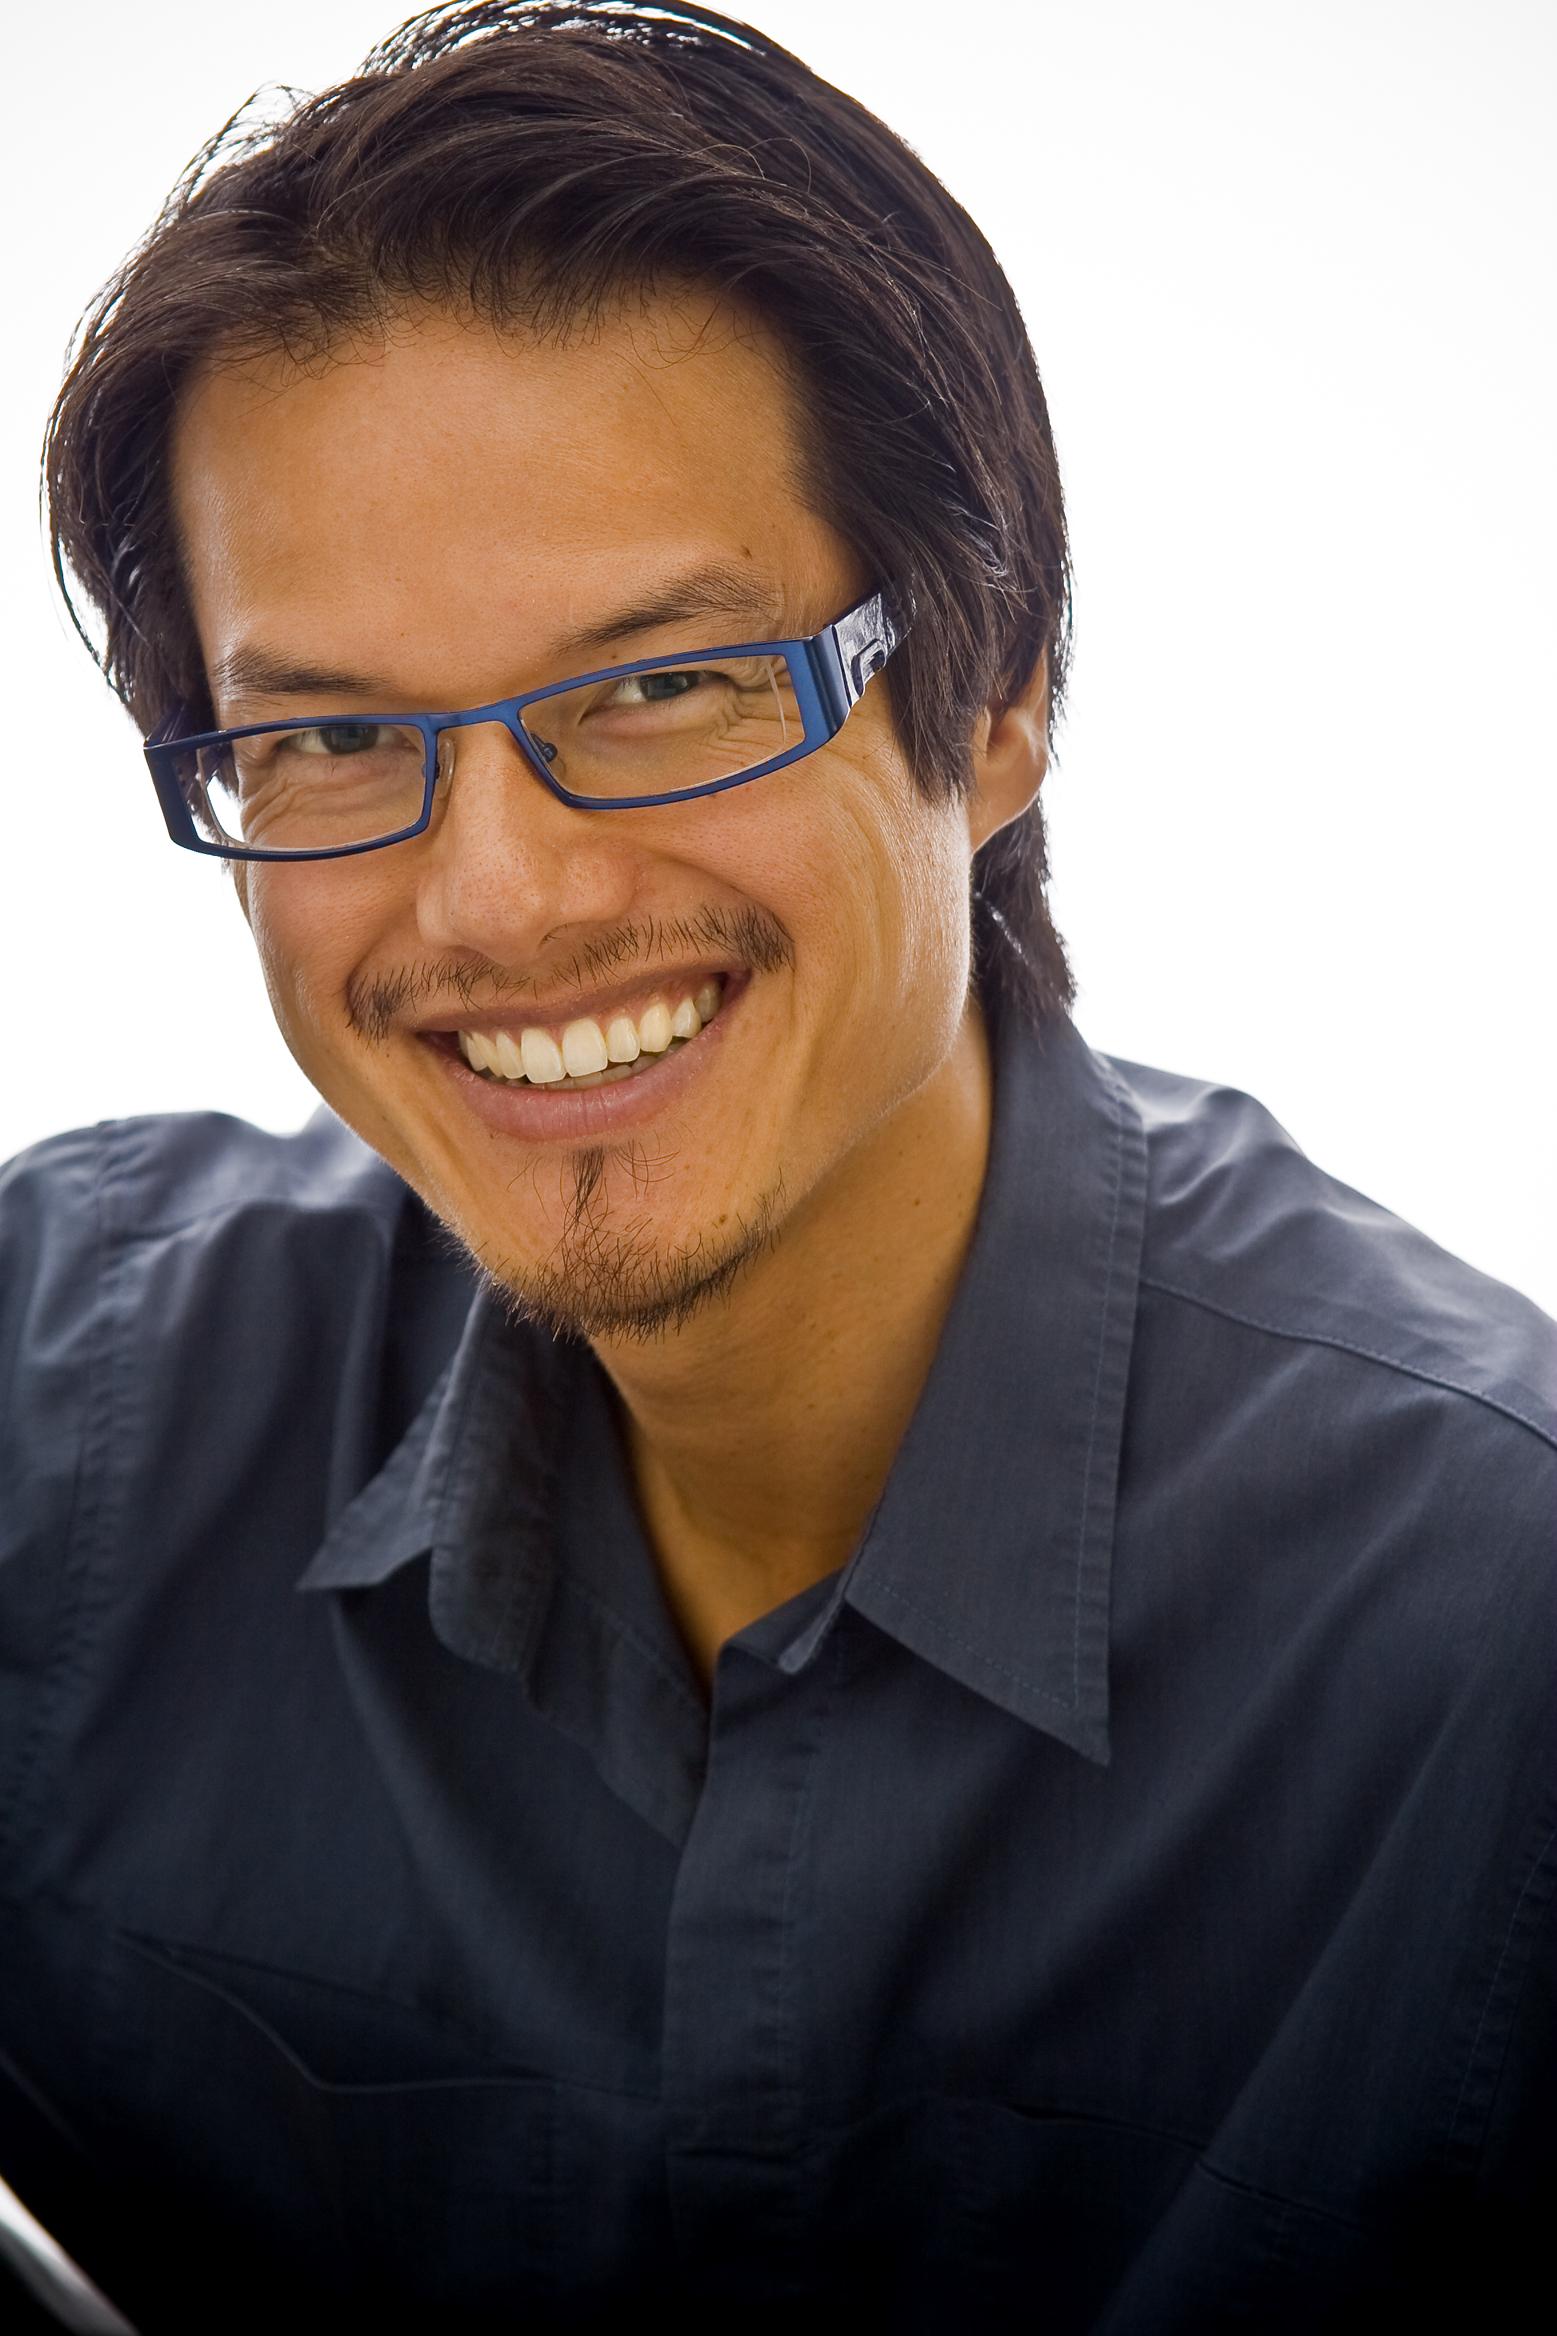 JON YEO - EXECUTIVE SPEAKER COACH